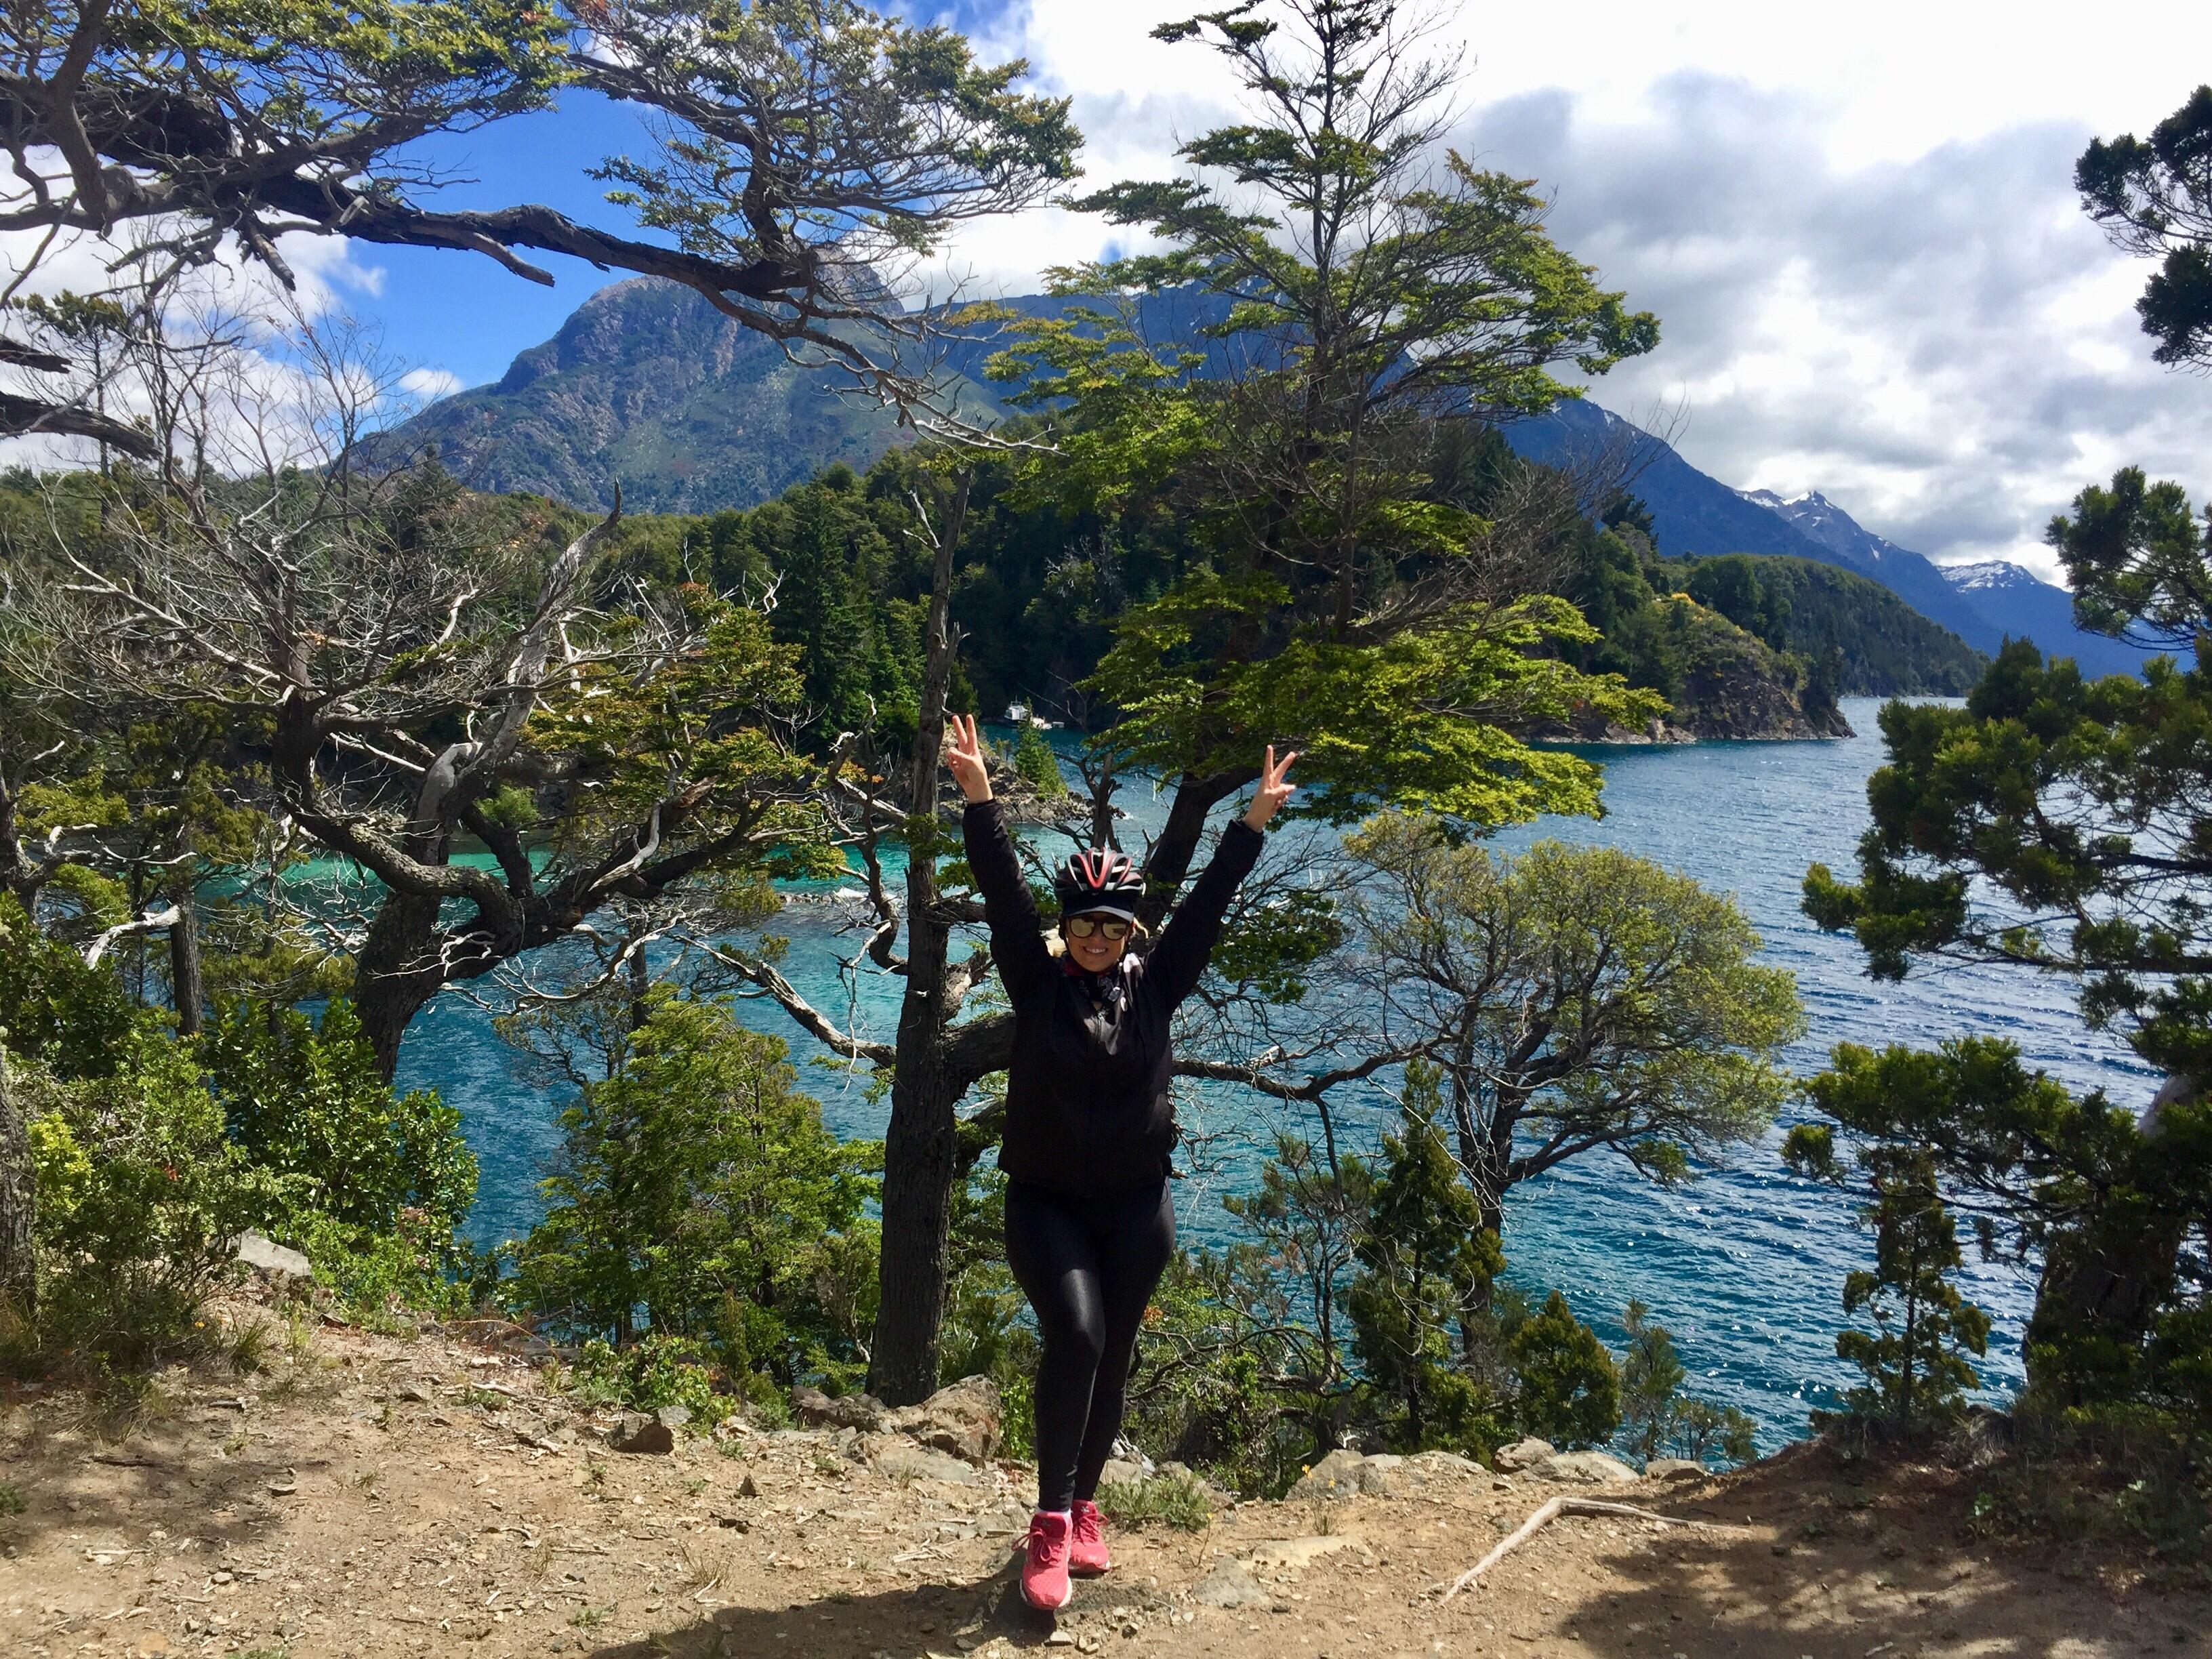 Circuito Chico : Bariloche u circuito chico de bike e cerro campanário u frida viaja